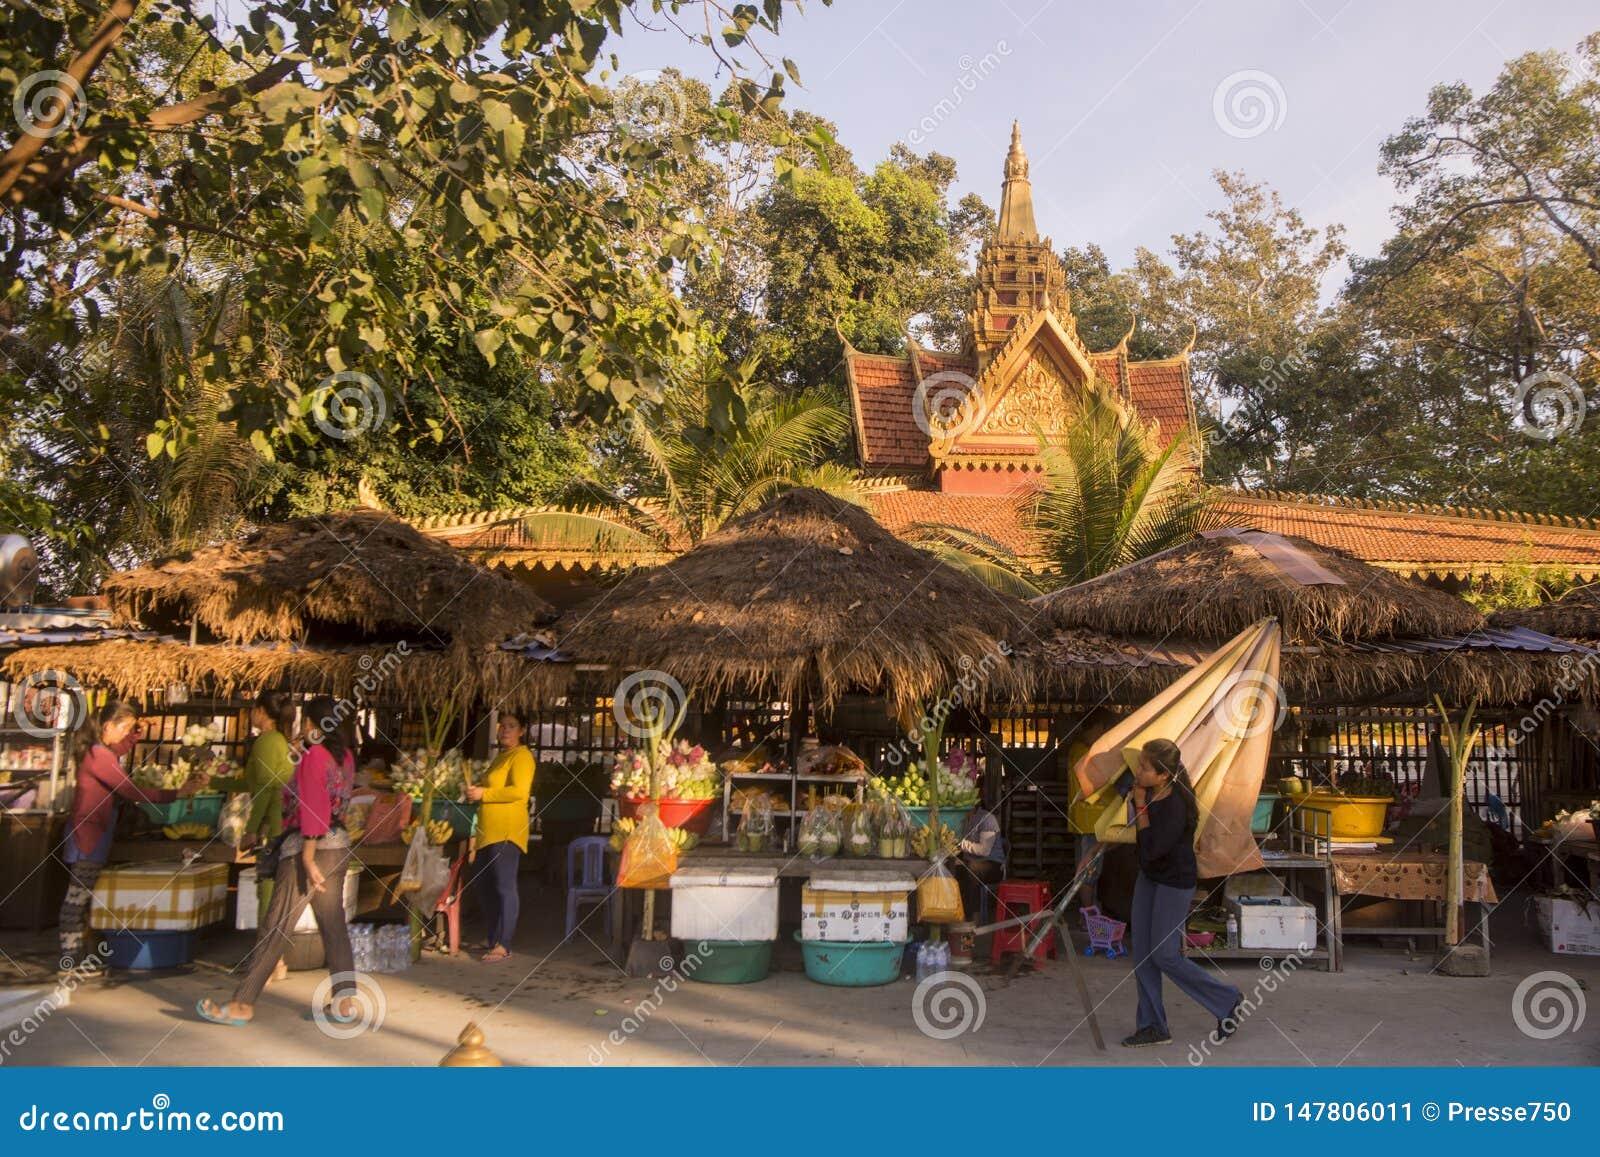 CAMBODIA SIEM REAP PREAH ANG CHORM SHRINE